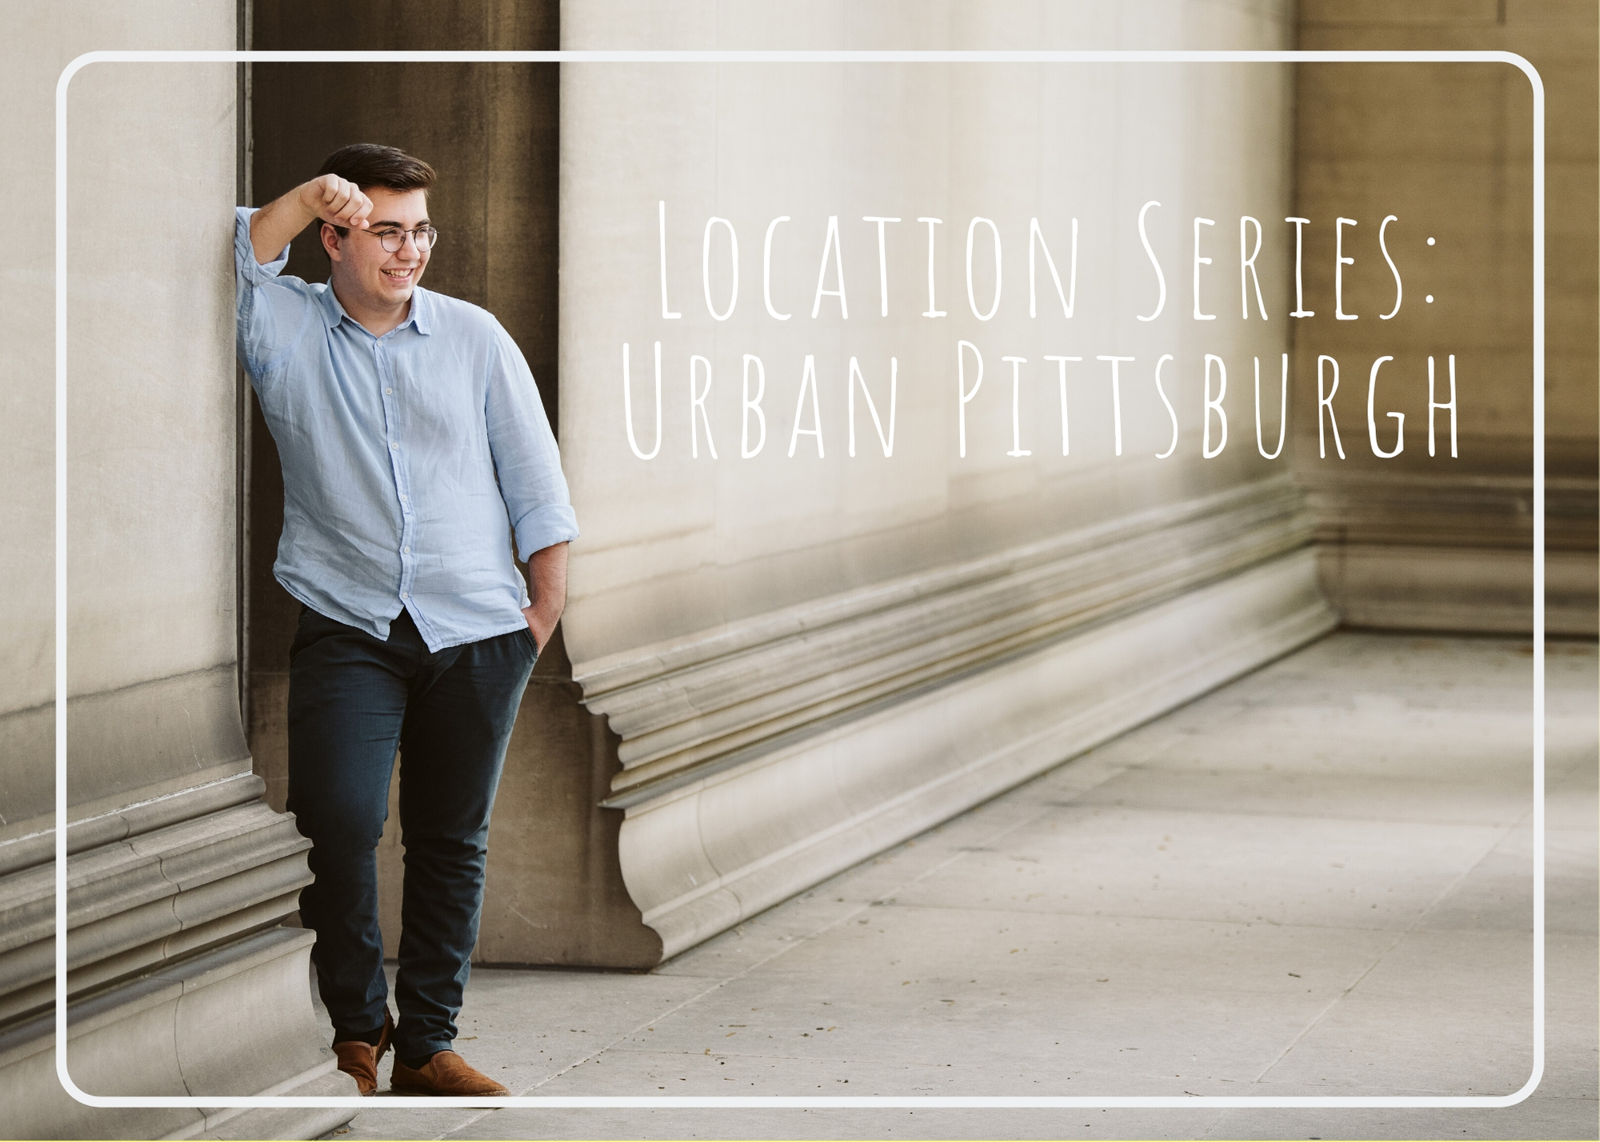 Senior Location Series: Urban Pittsburgh